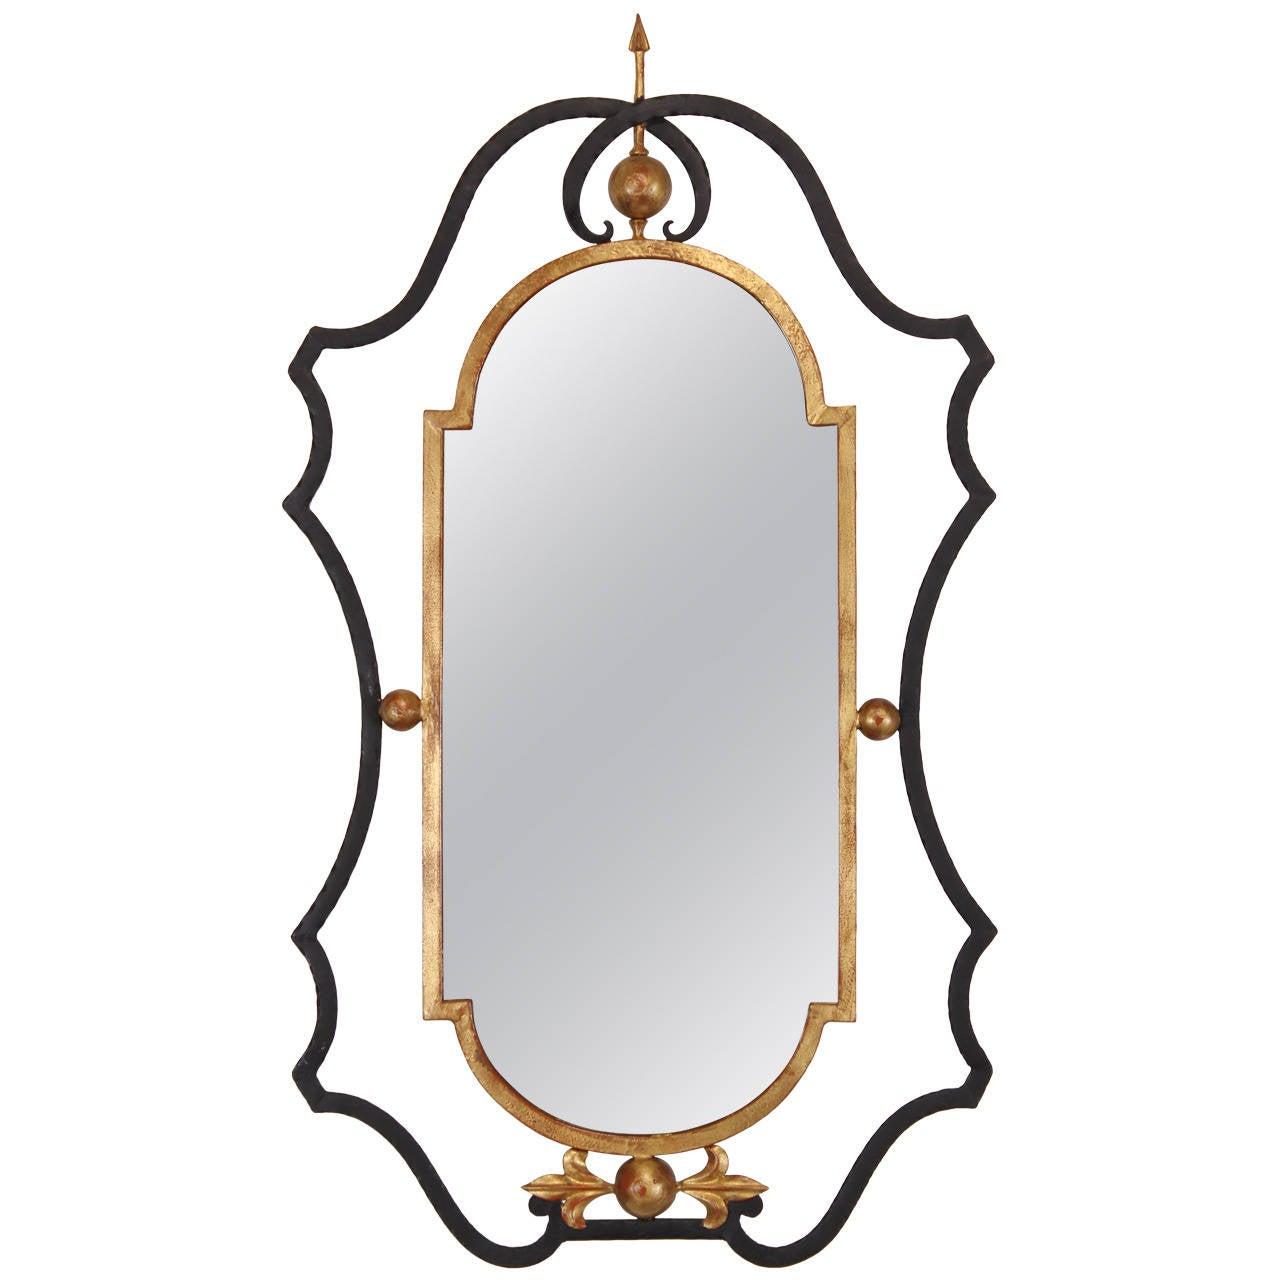 Italian wrought iron and gilt palladio mirror 1960 at 1stdibs for Wrought iron mirror